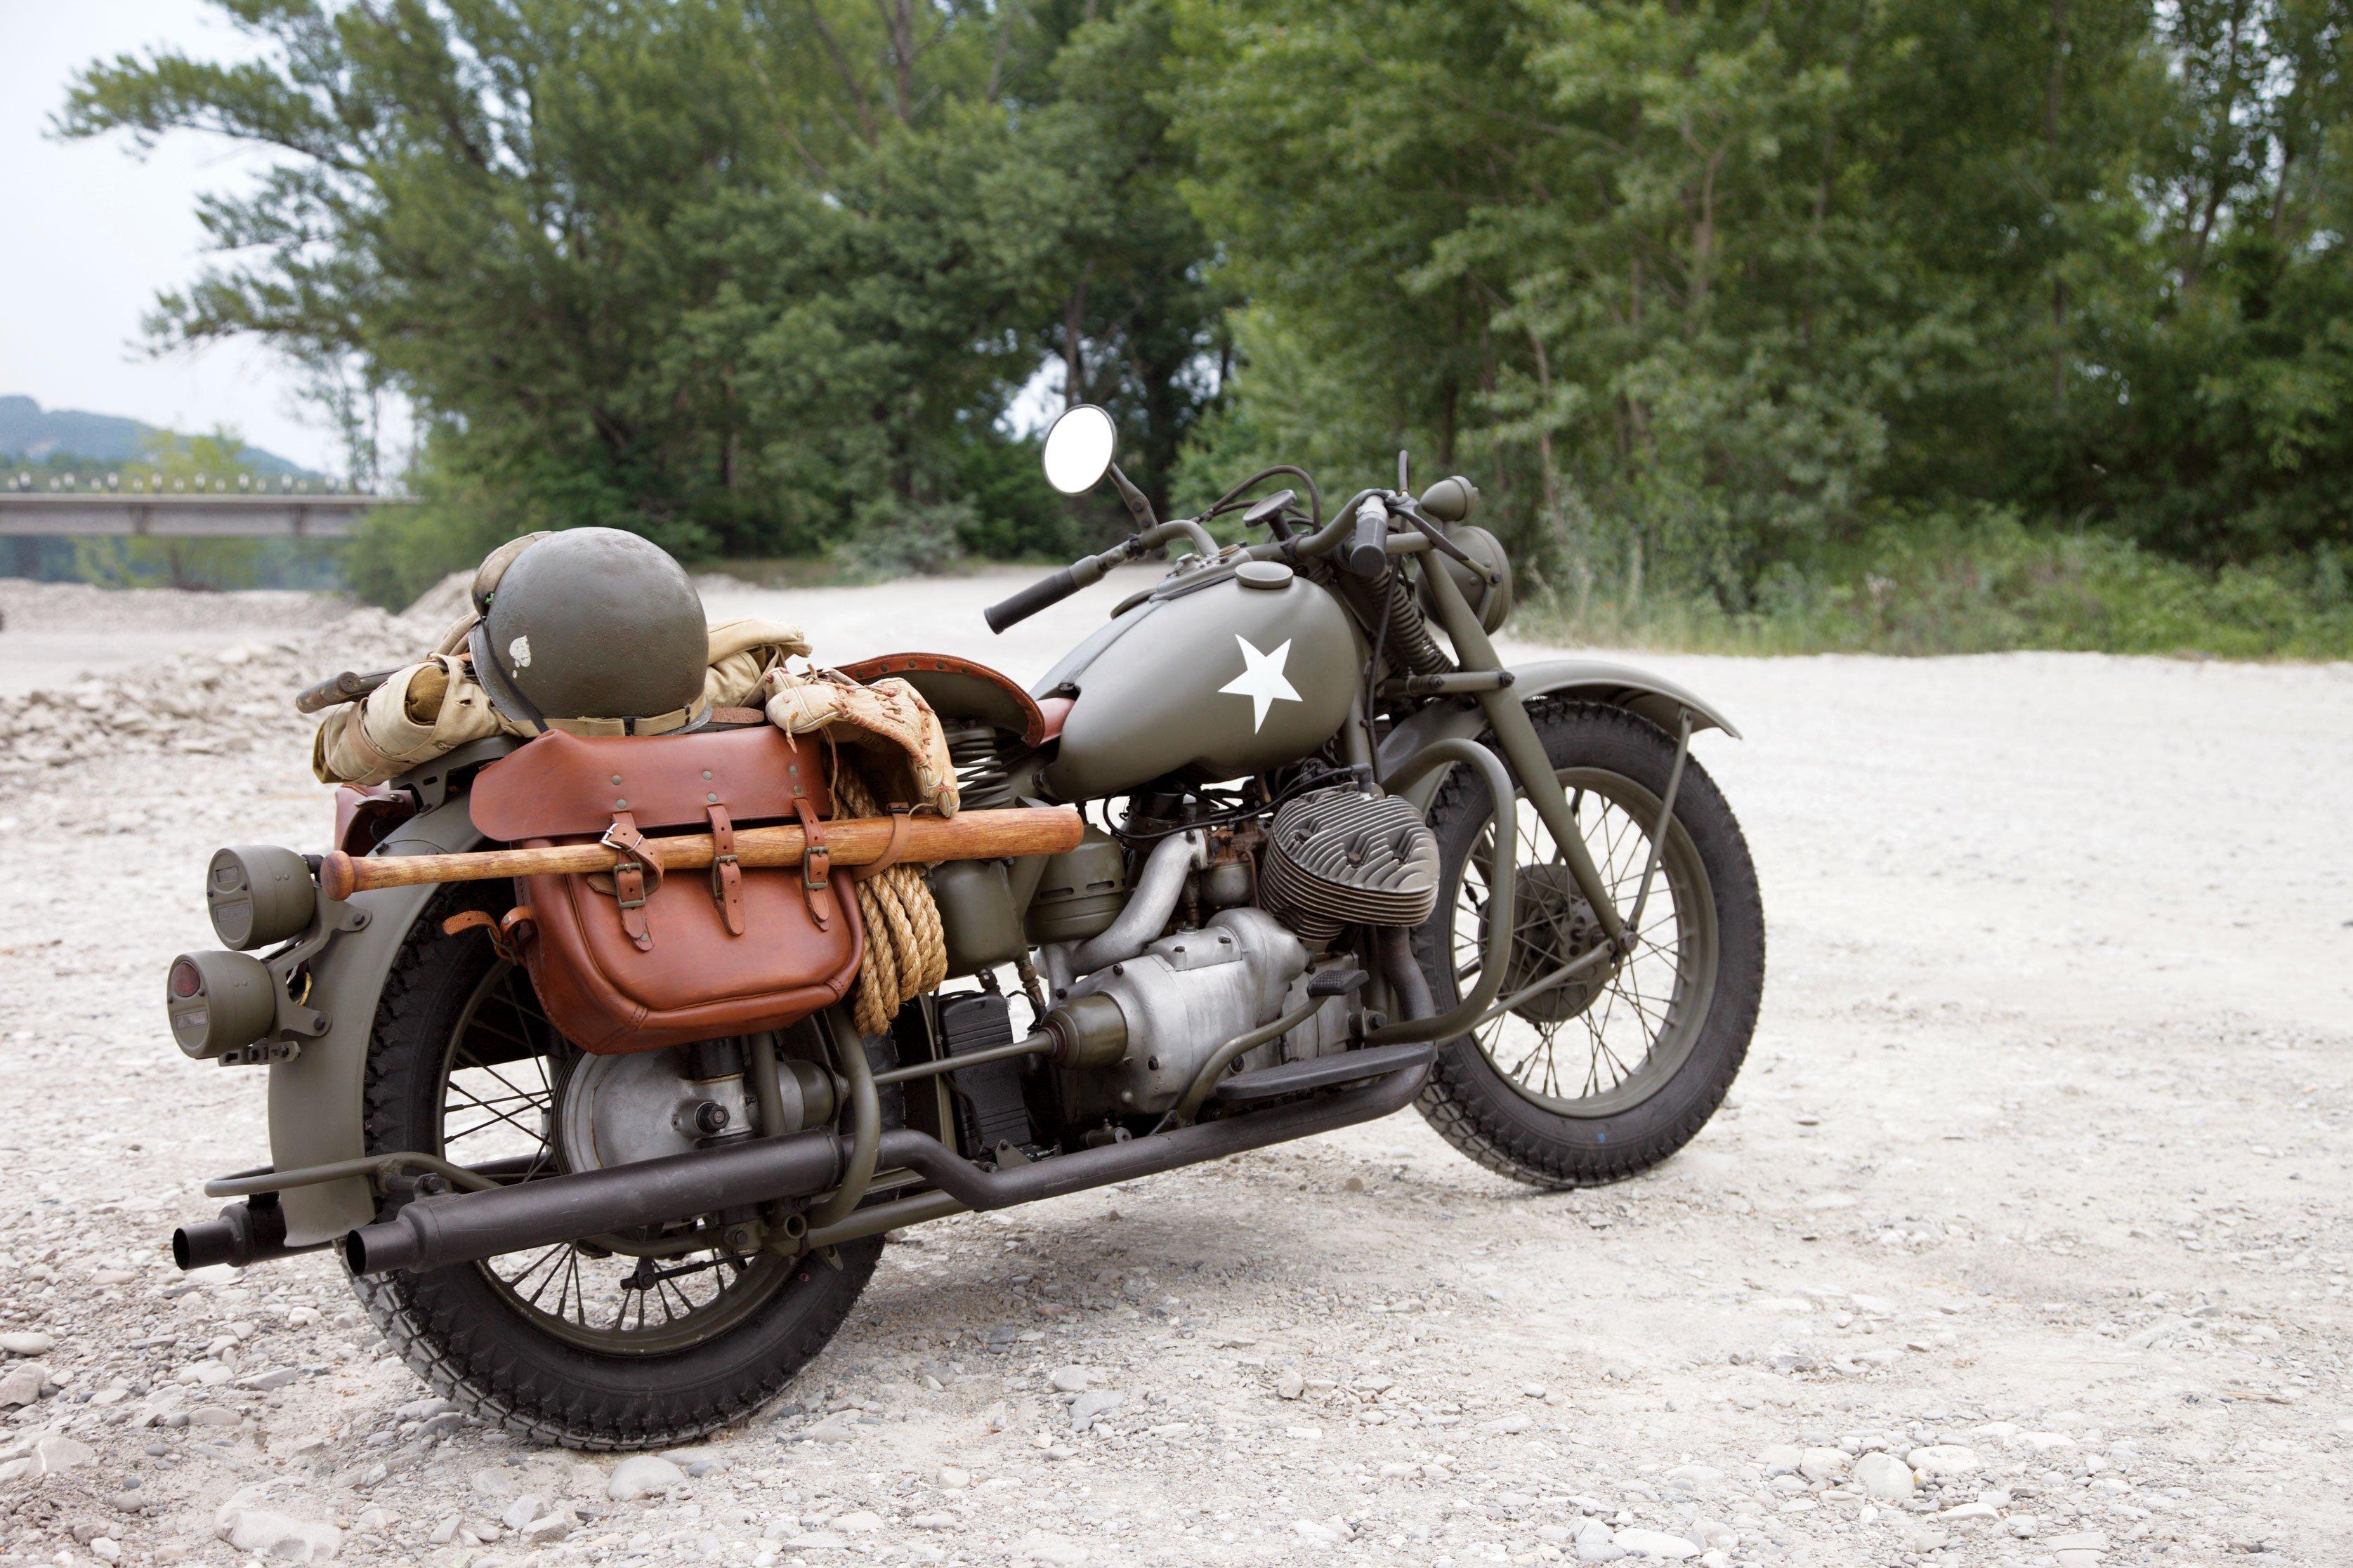 BMW vintage retro motorbike motorcycle bike classic 3350x2233